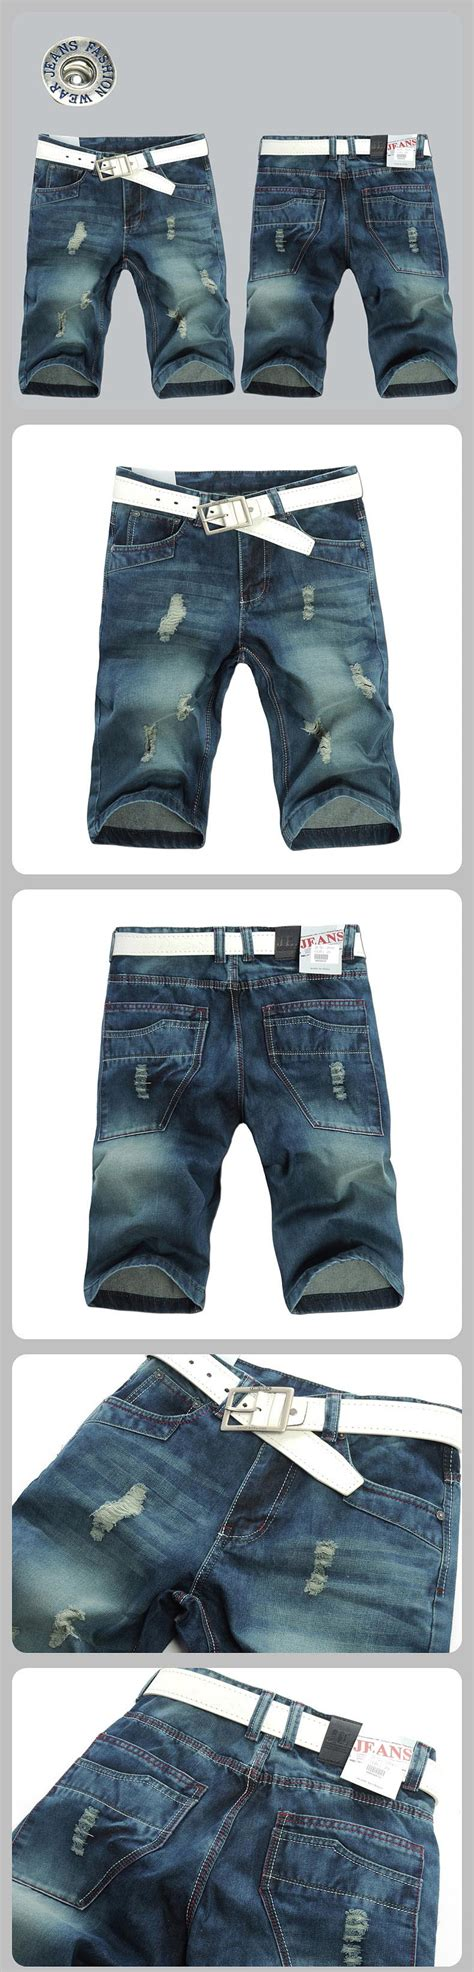 Celana Bahan Semi Woll Slimfit celana pendek slim fit cp055 darwismarket